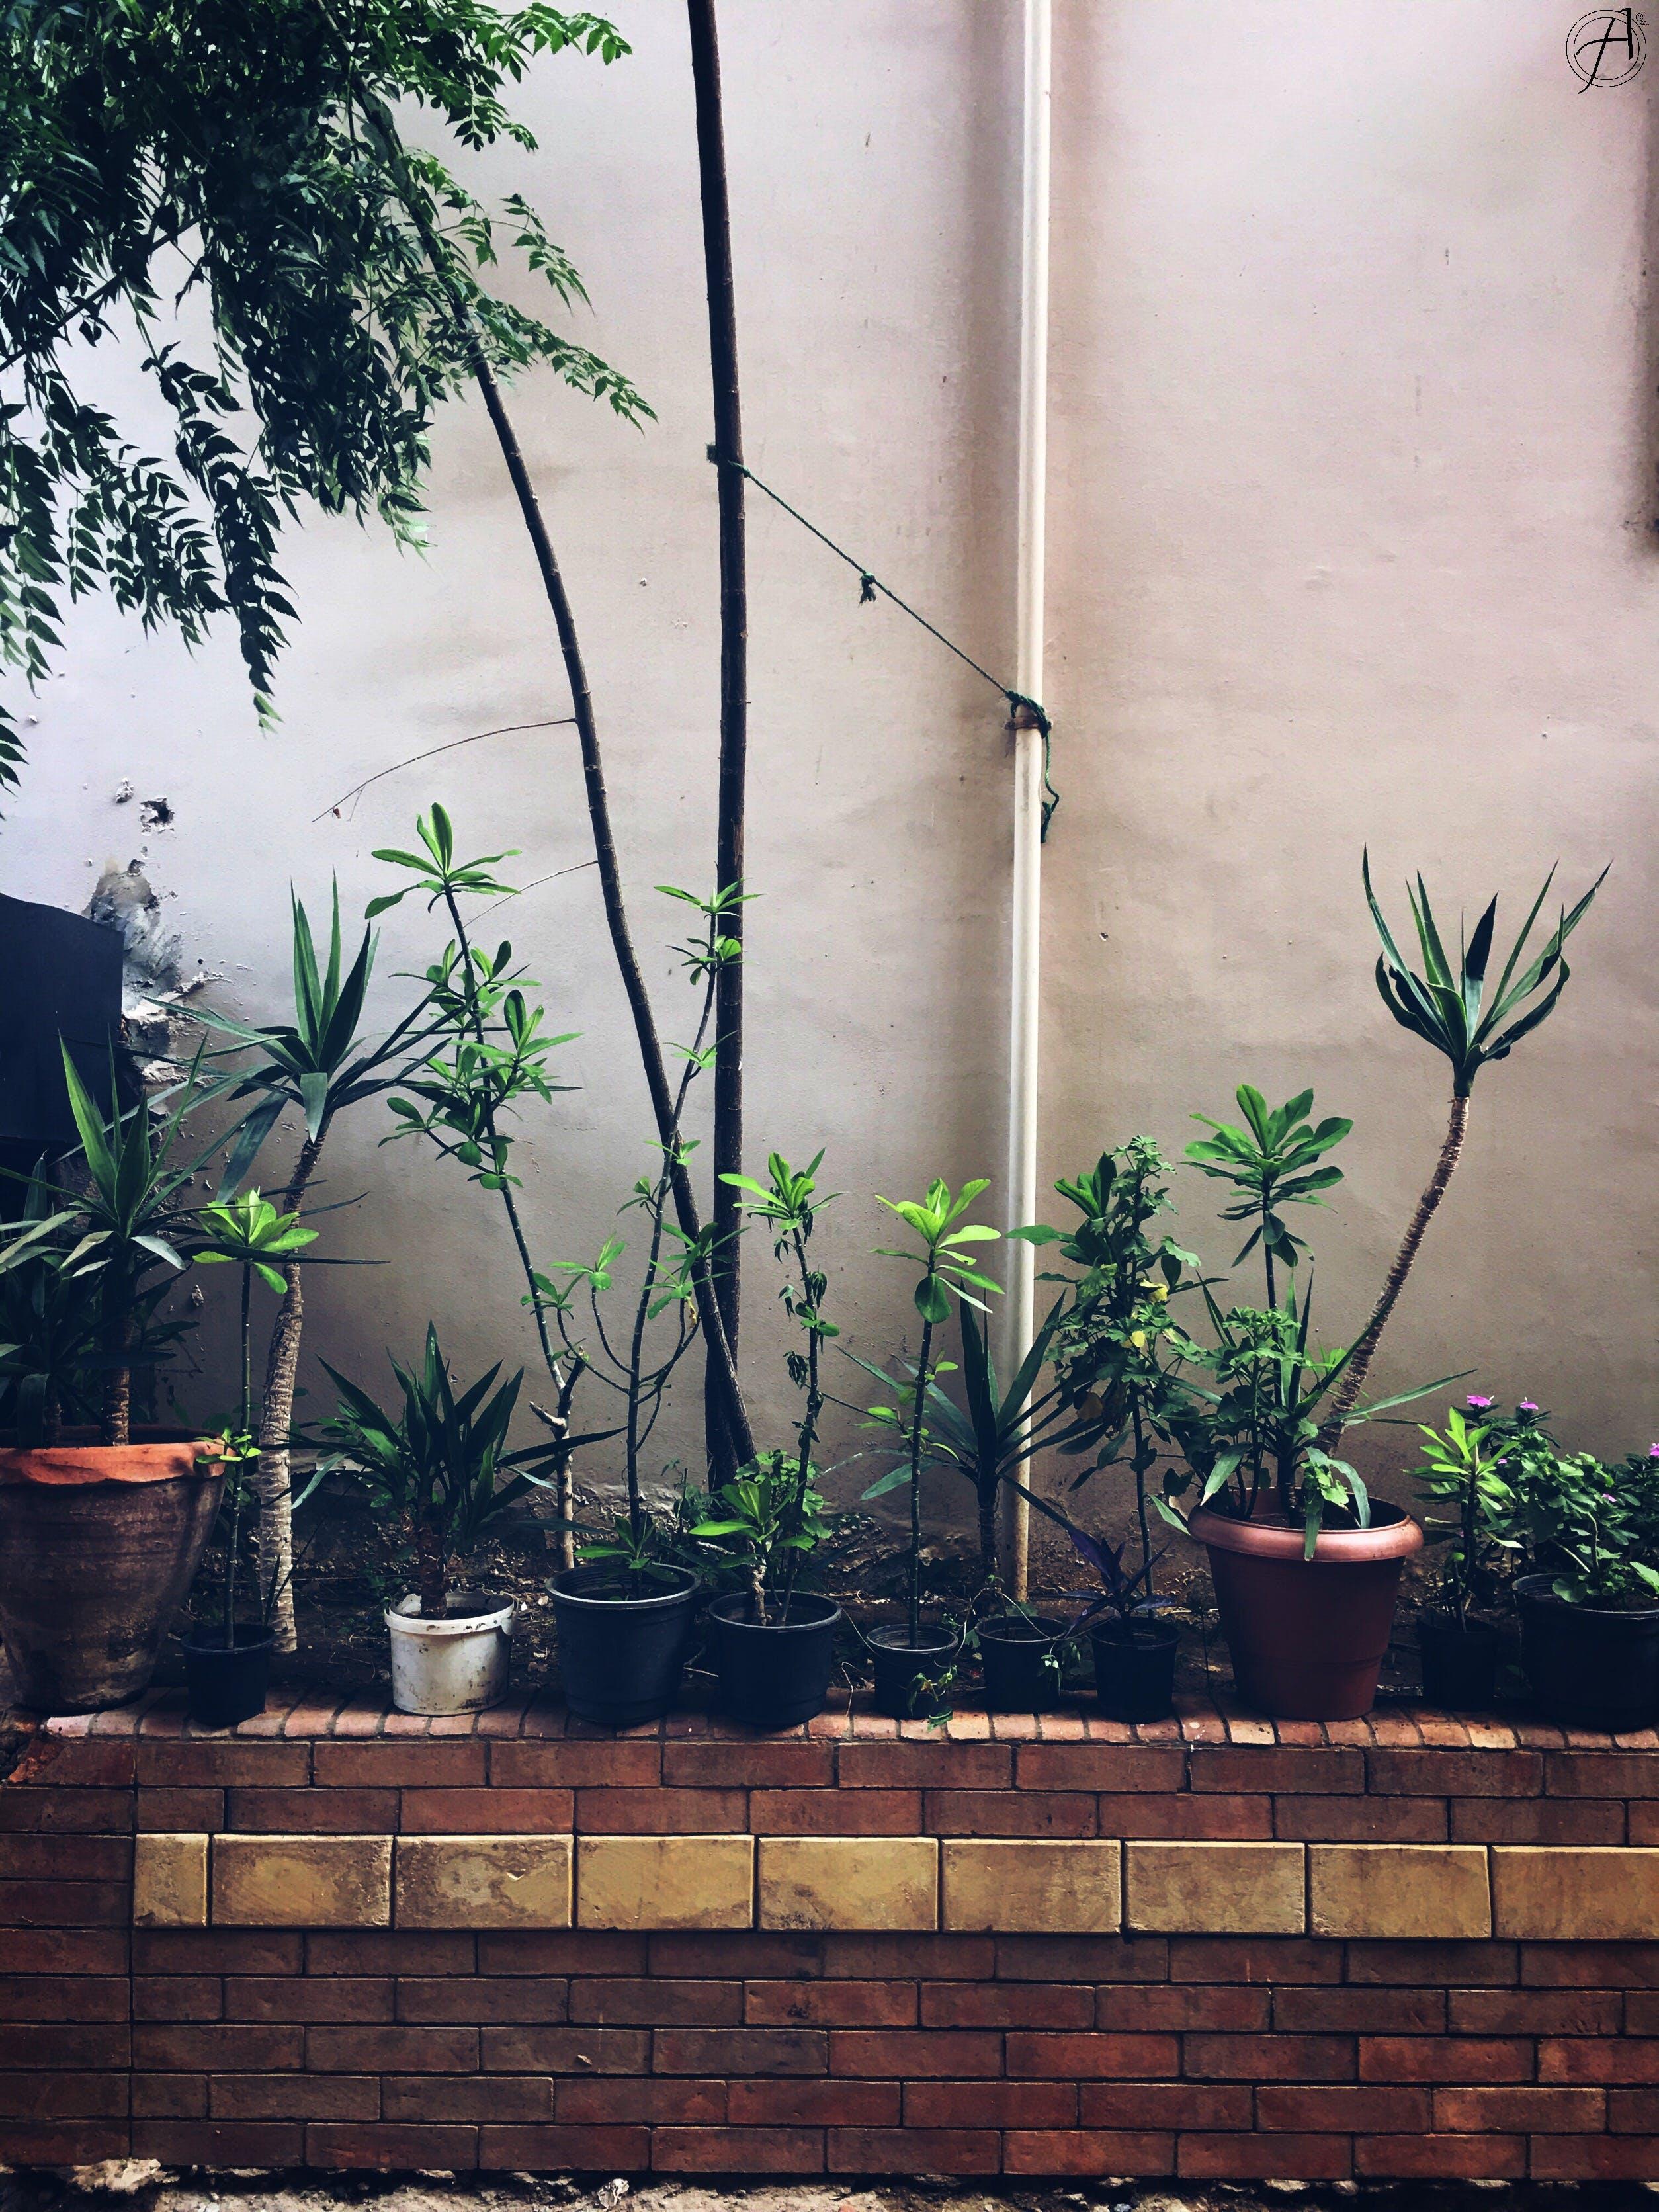 Free stock photo of dark green, Hello, iphone 6s, plants